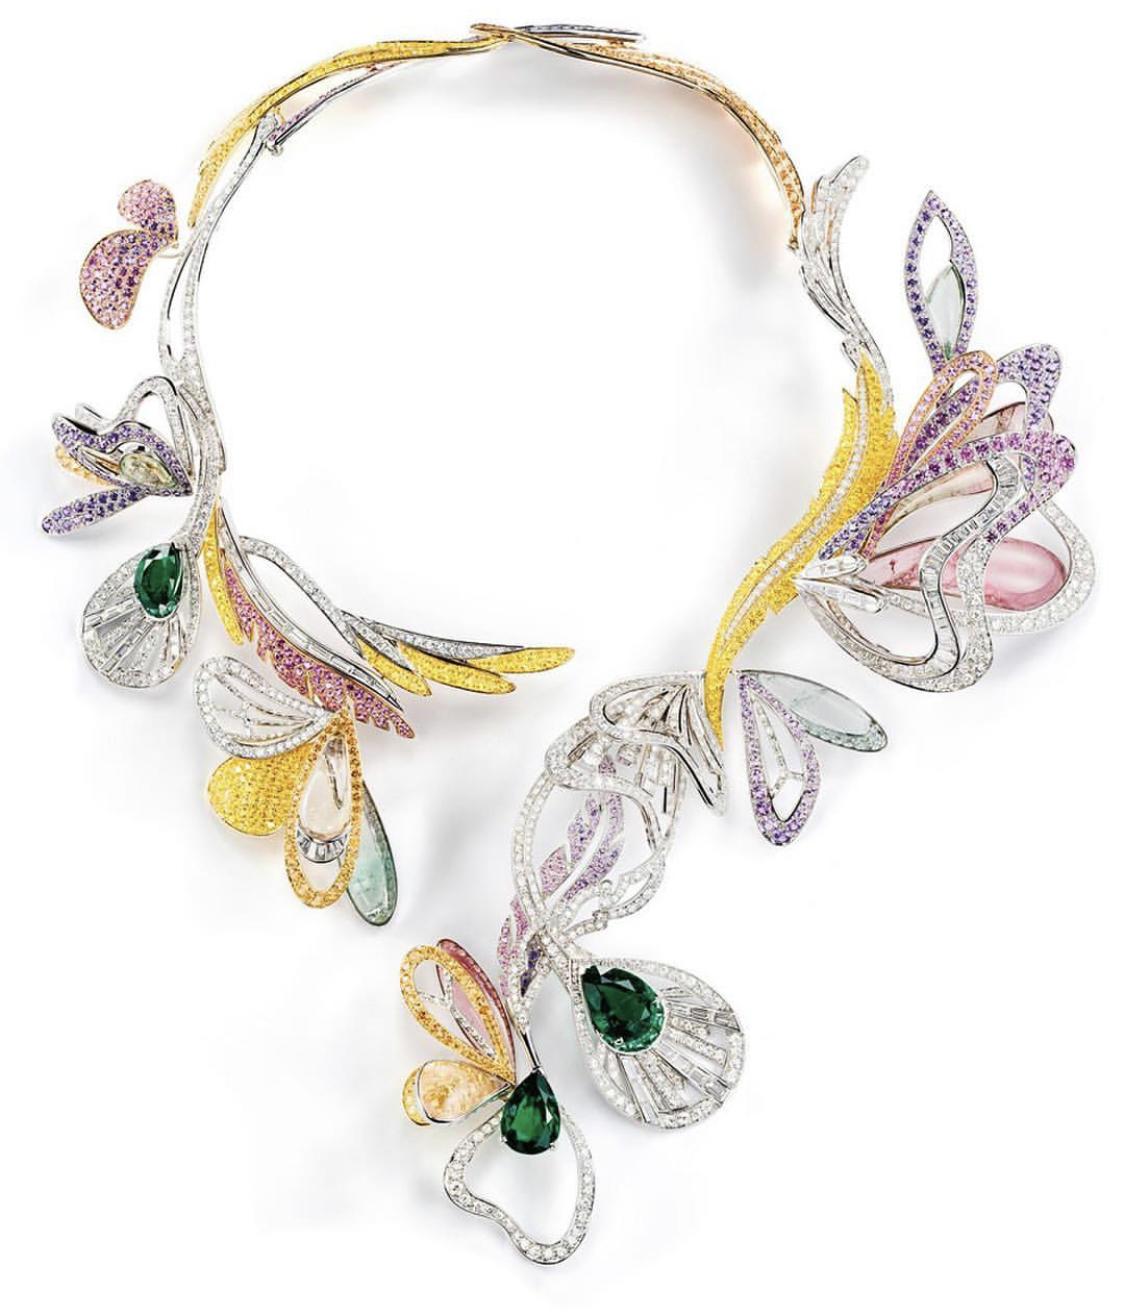 Emerald Diamond Leaf Neck Piece by Alex Blal